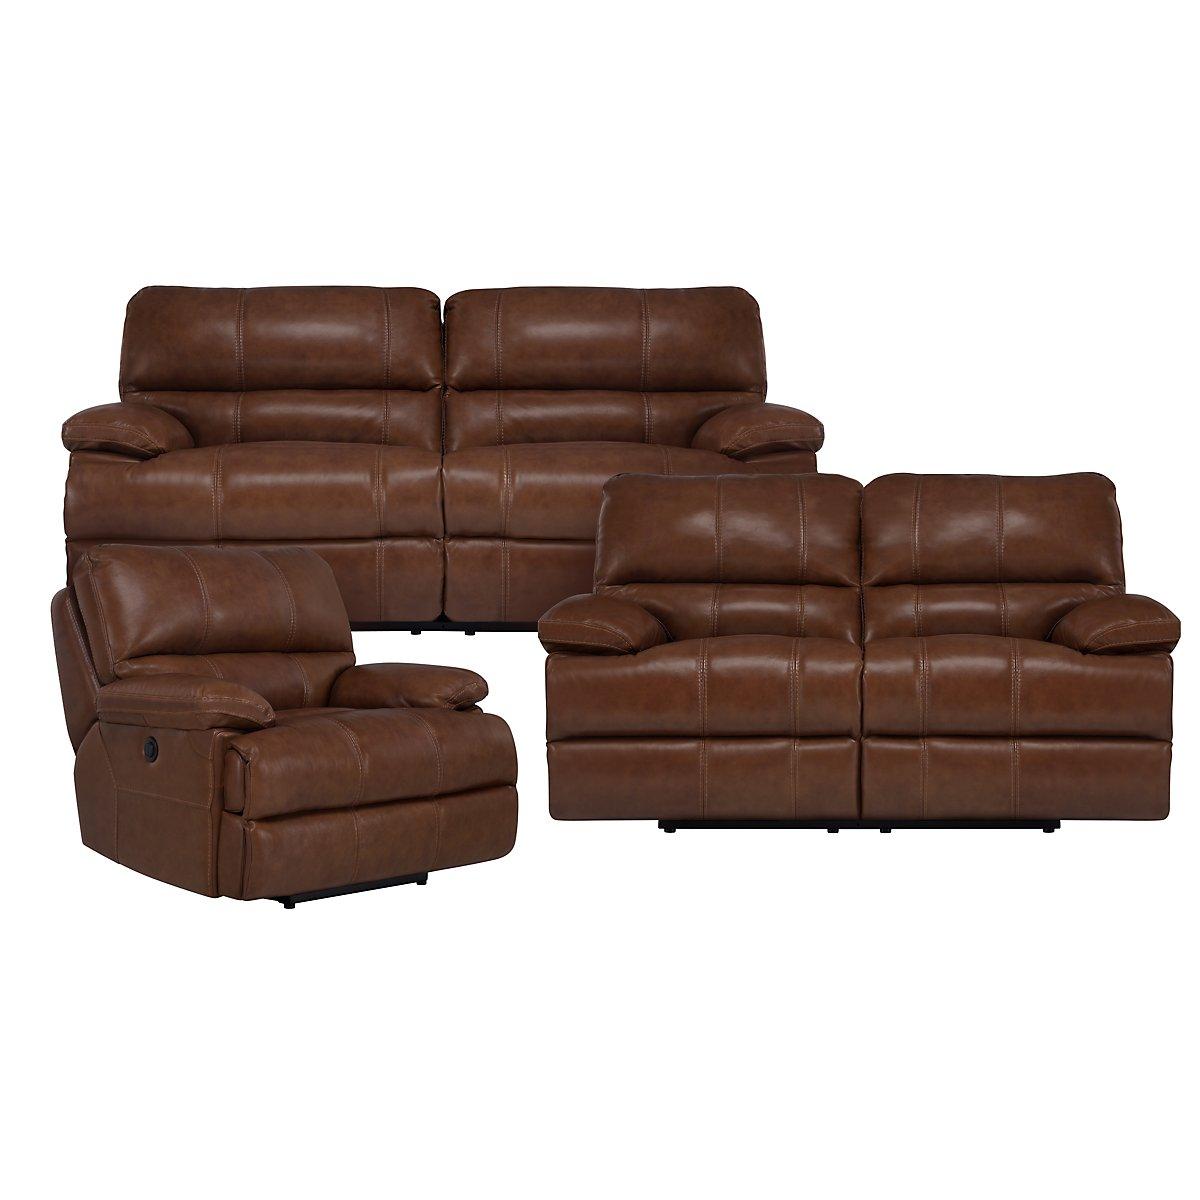 Alton2 Medium Brown Leather & Vinyl Power Reclining Living Room